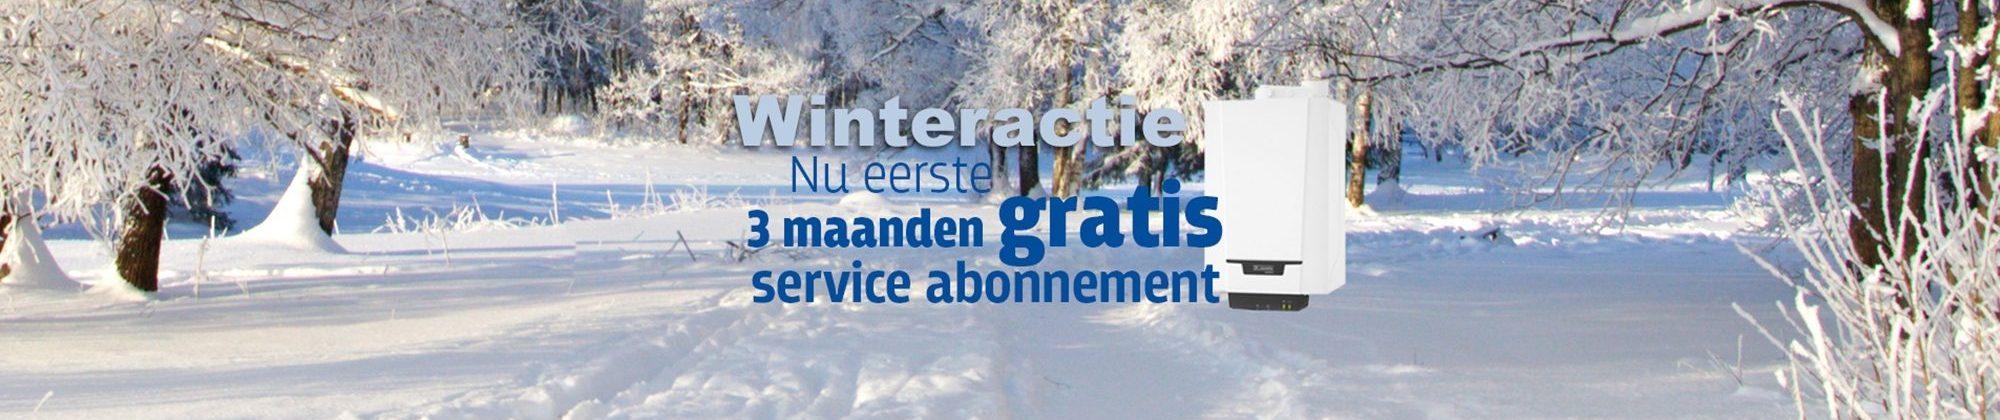 Header-Winter-Actie-2000px_2000x420_acf_cropped